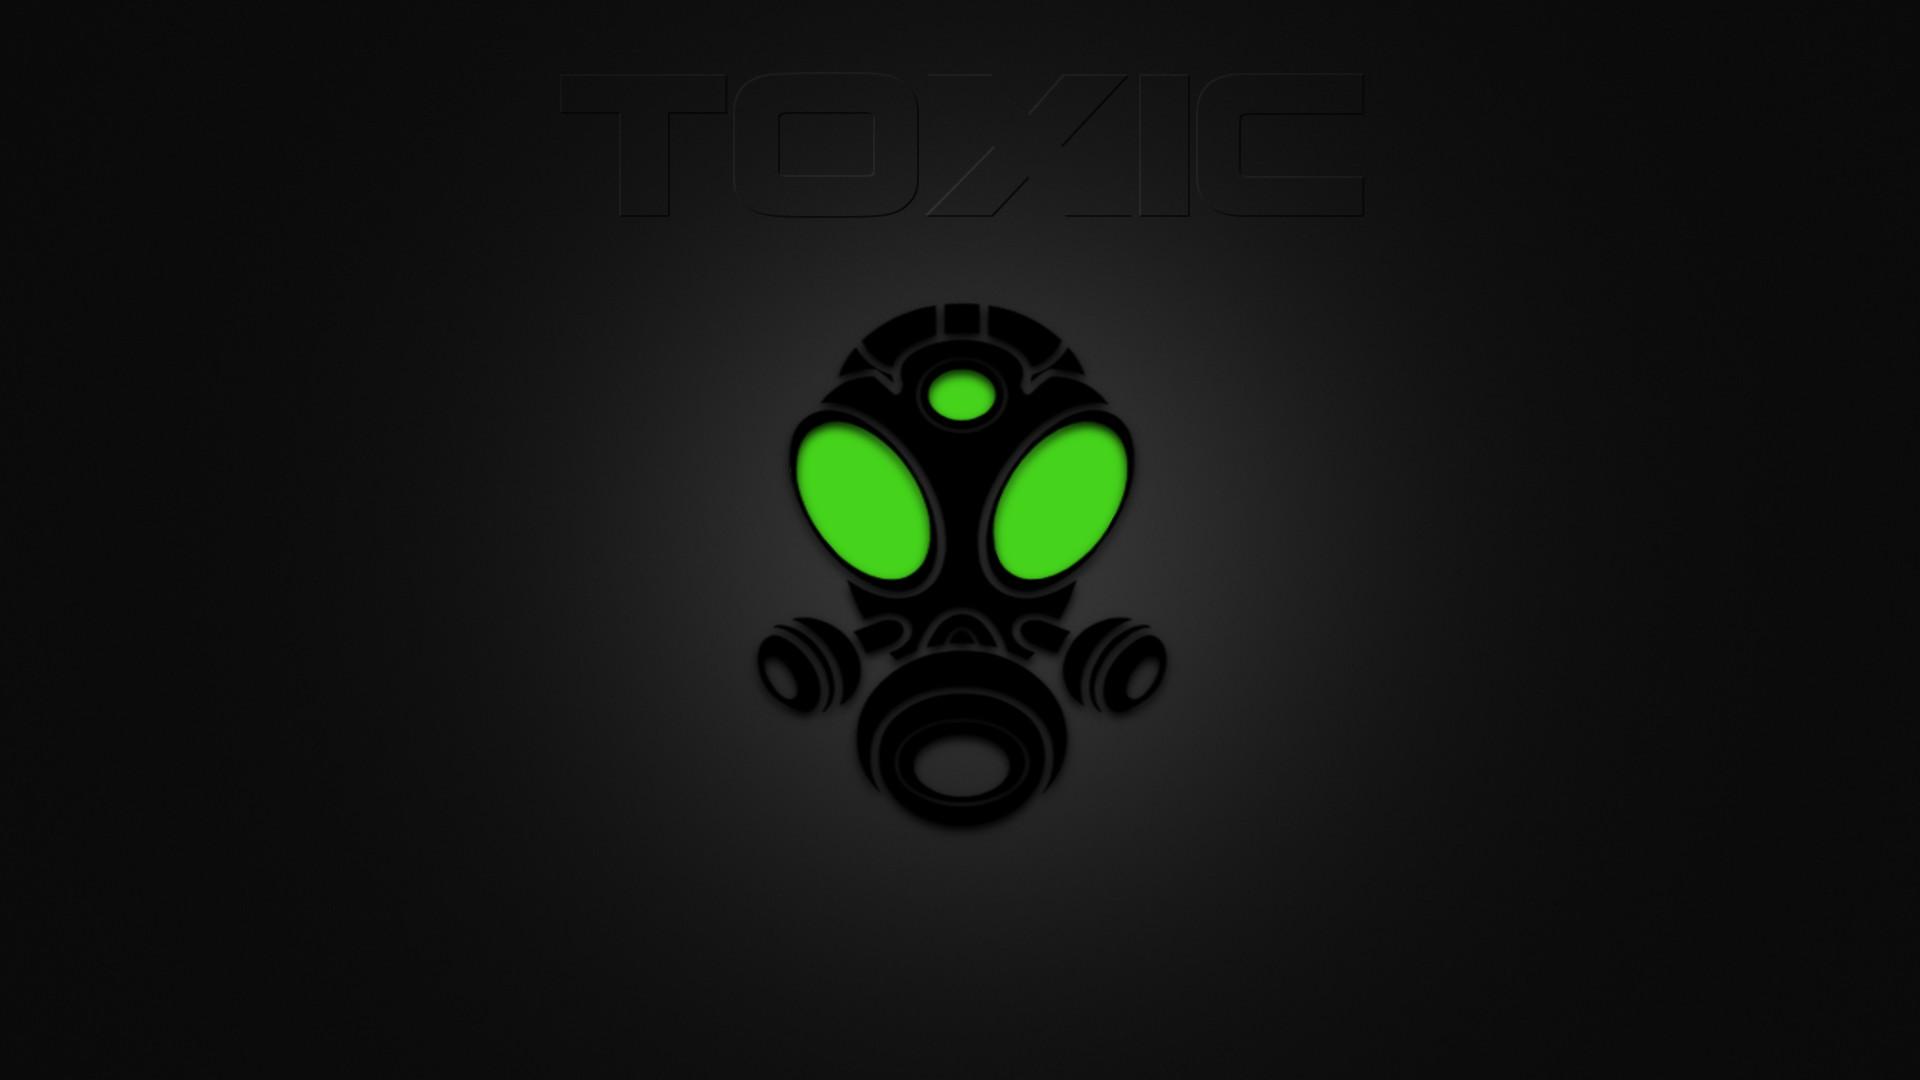 Electro Wallpaper Girl Toxic Mask Wallpaper 53 Images